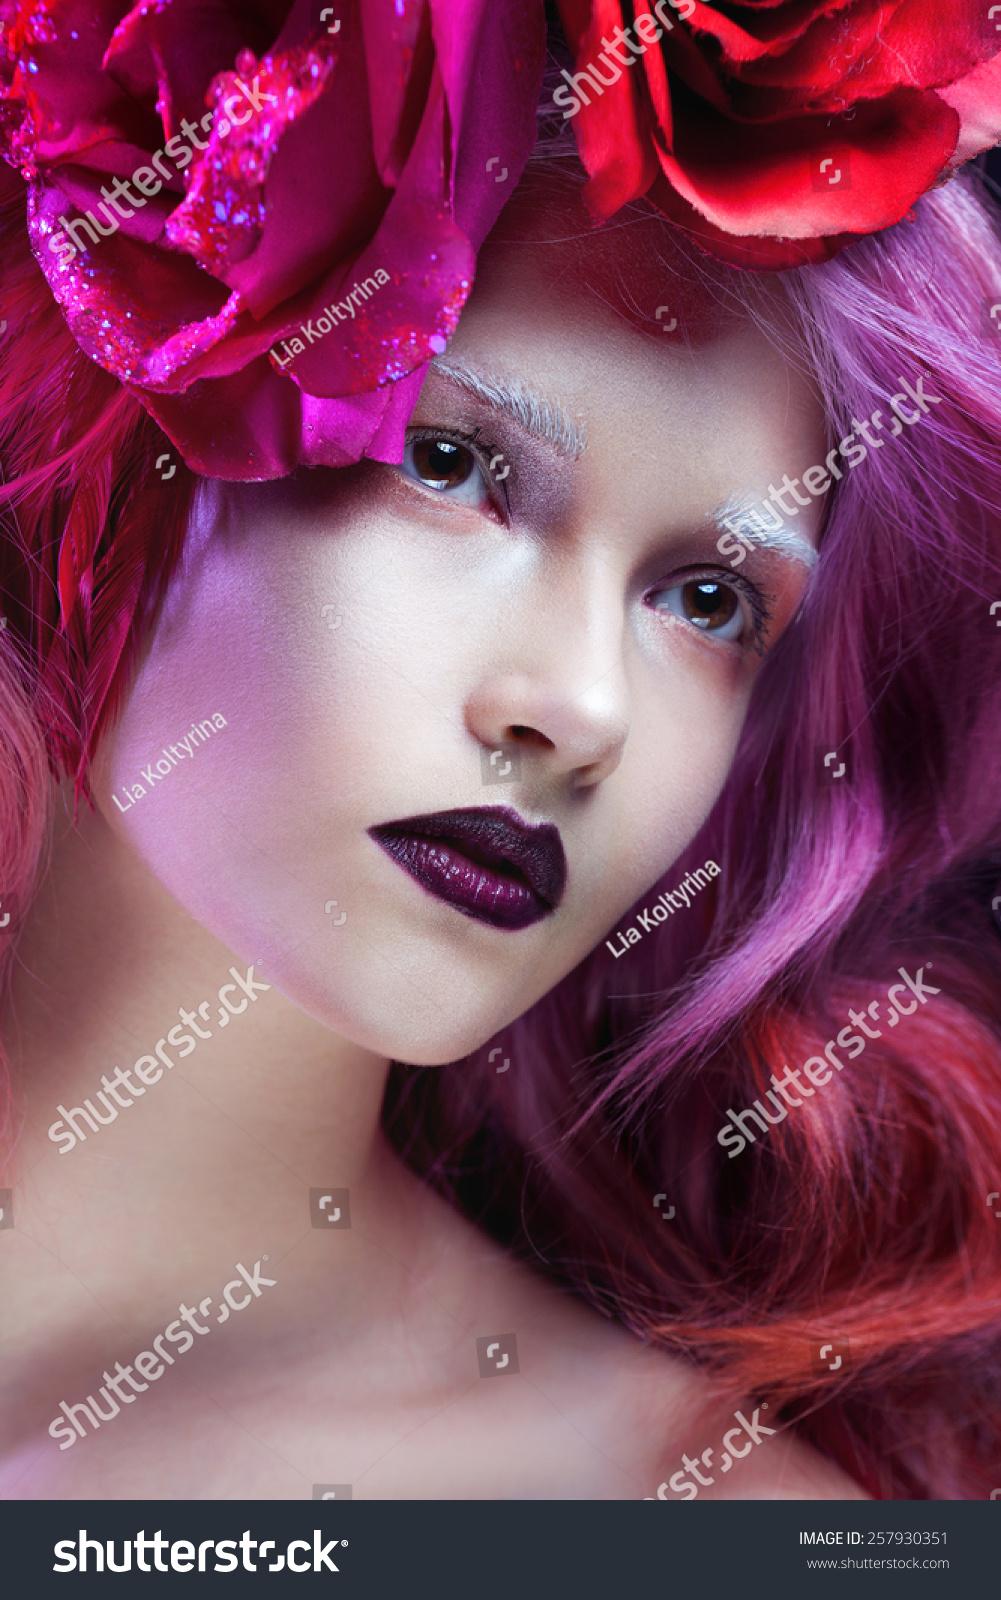 Beautiful girl pink hair flowers hair stock photo 257930351 beautiful girl with pink hair flowers in the hair izmirmasajfo Gallery